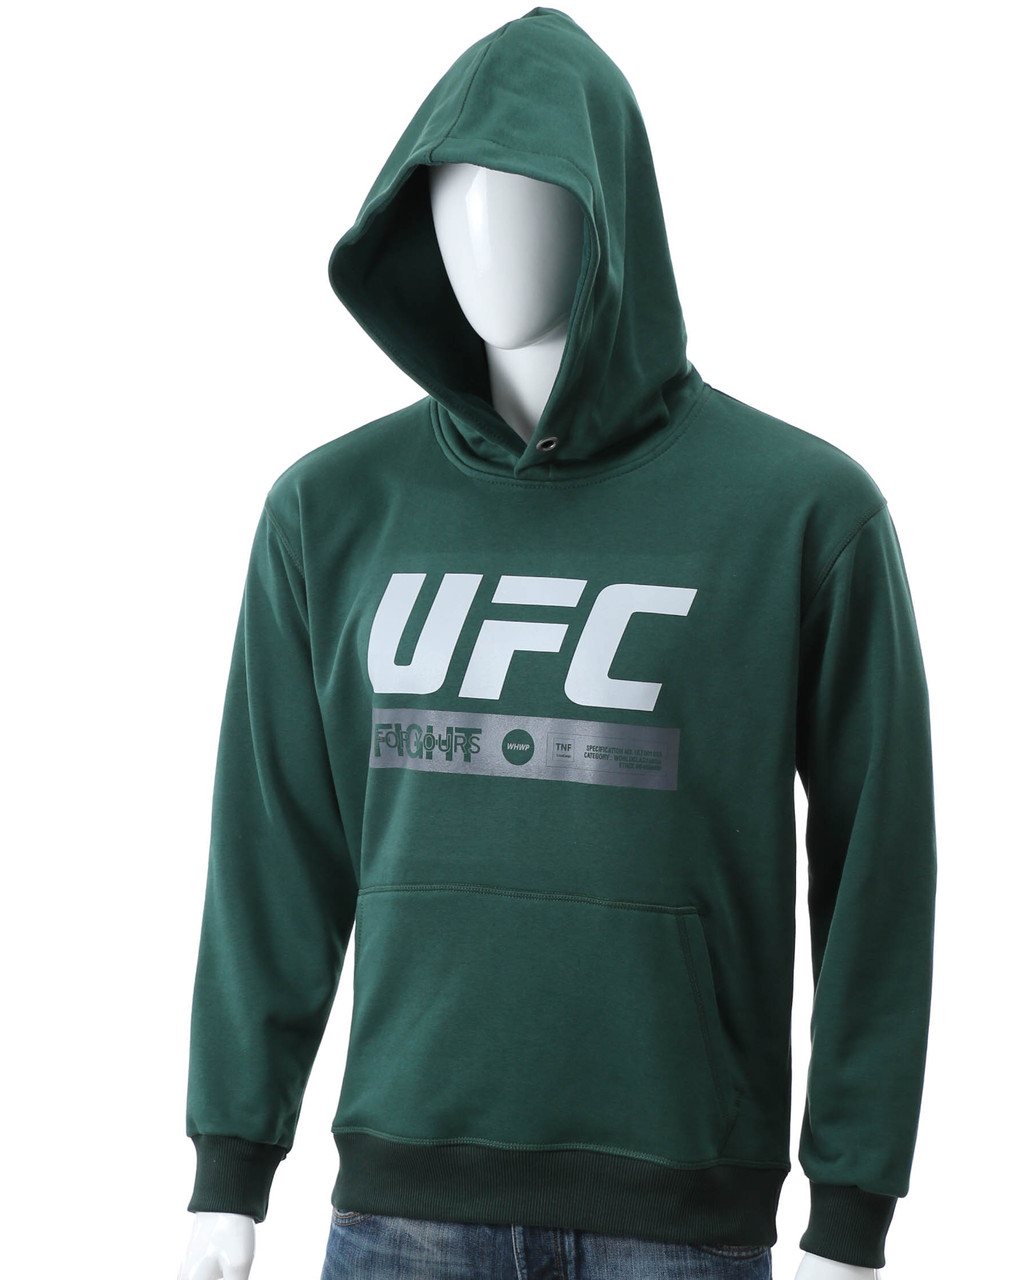 Худи т зеленый UFC FIGHT с лого Т-2 DGRN L(Р) 20-471-201